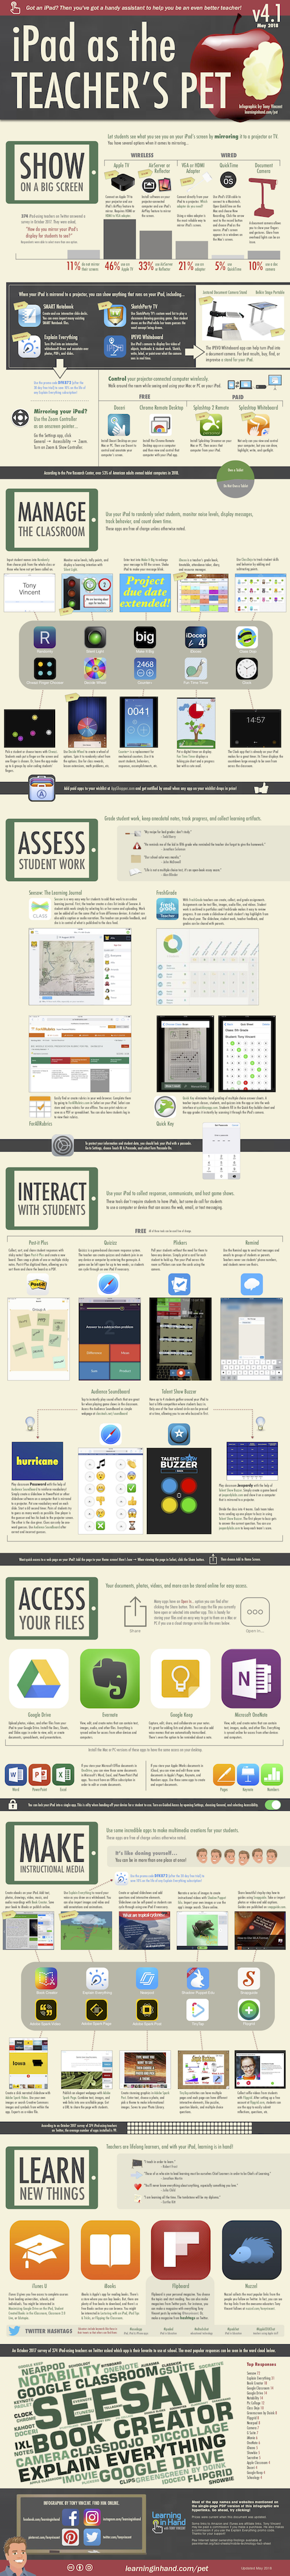 iPad as Teacher's Pet v41.png